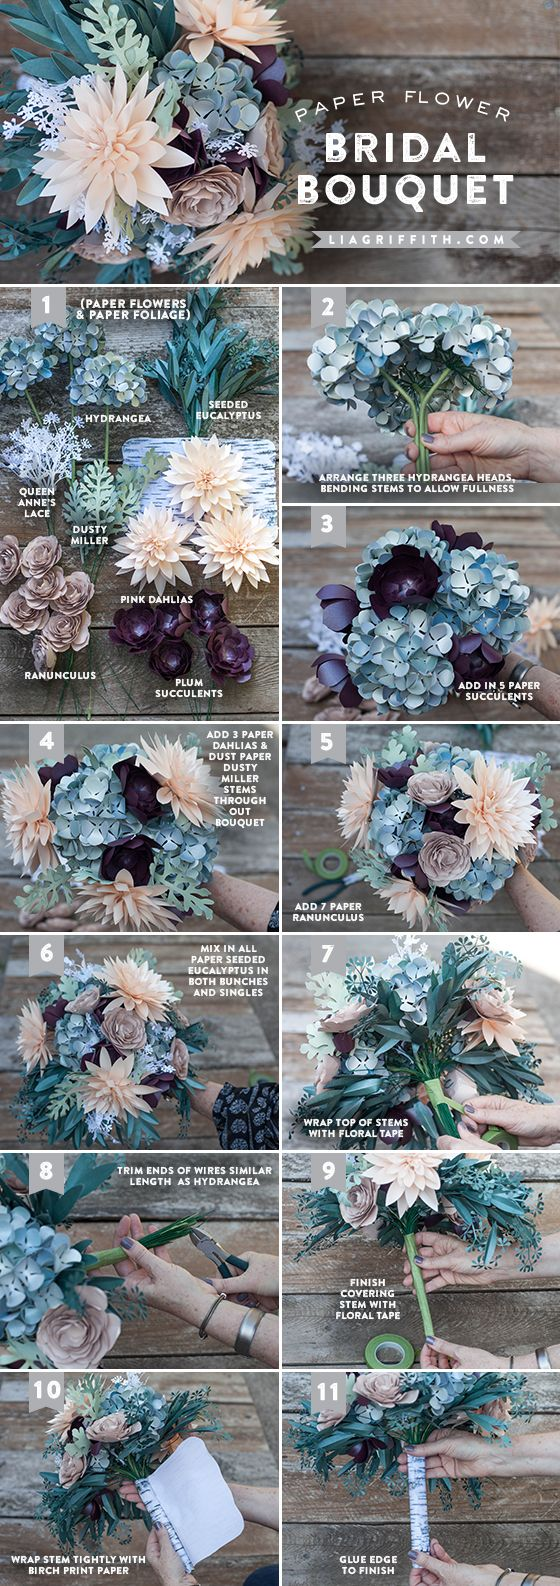 Diy rustic paper bridal bouquet bridal bouquets flower and tutorials diy rustic paper bridal bouquet lia griffith izmirmasajfo